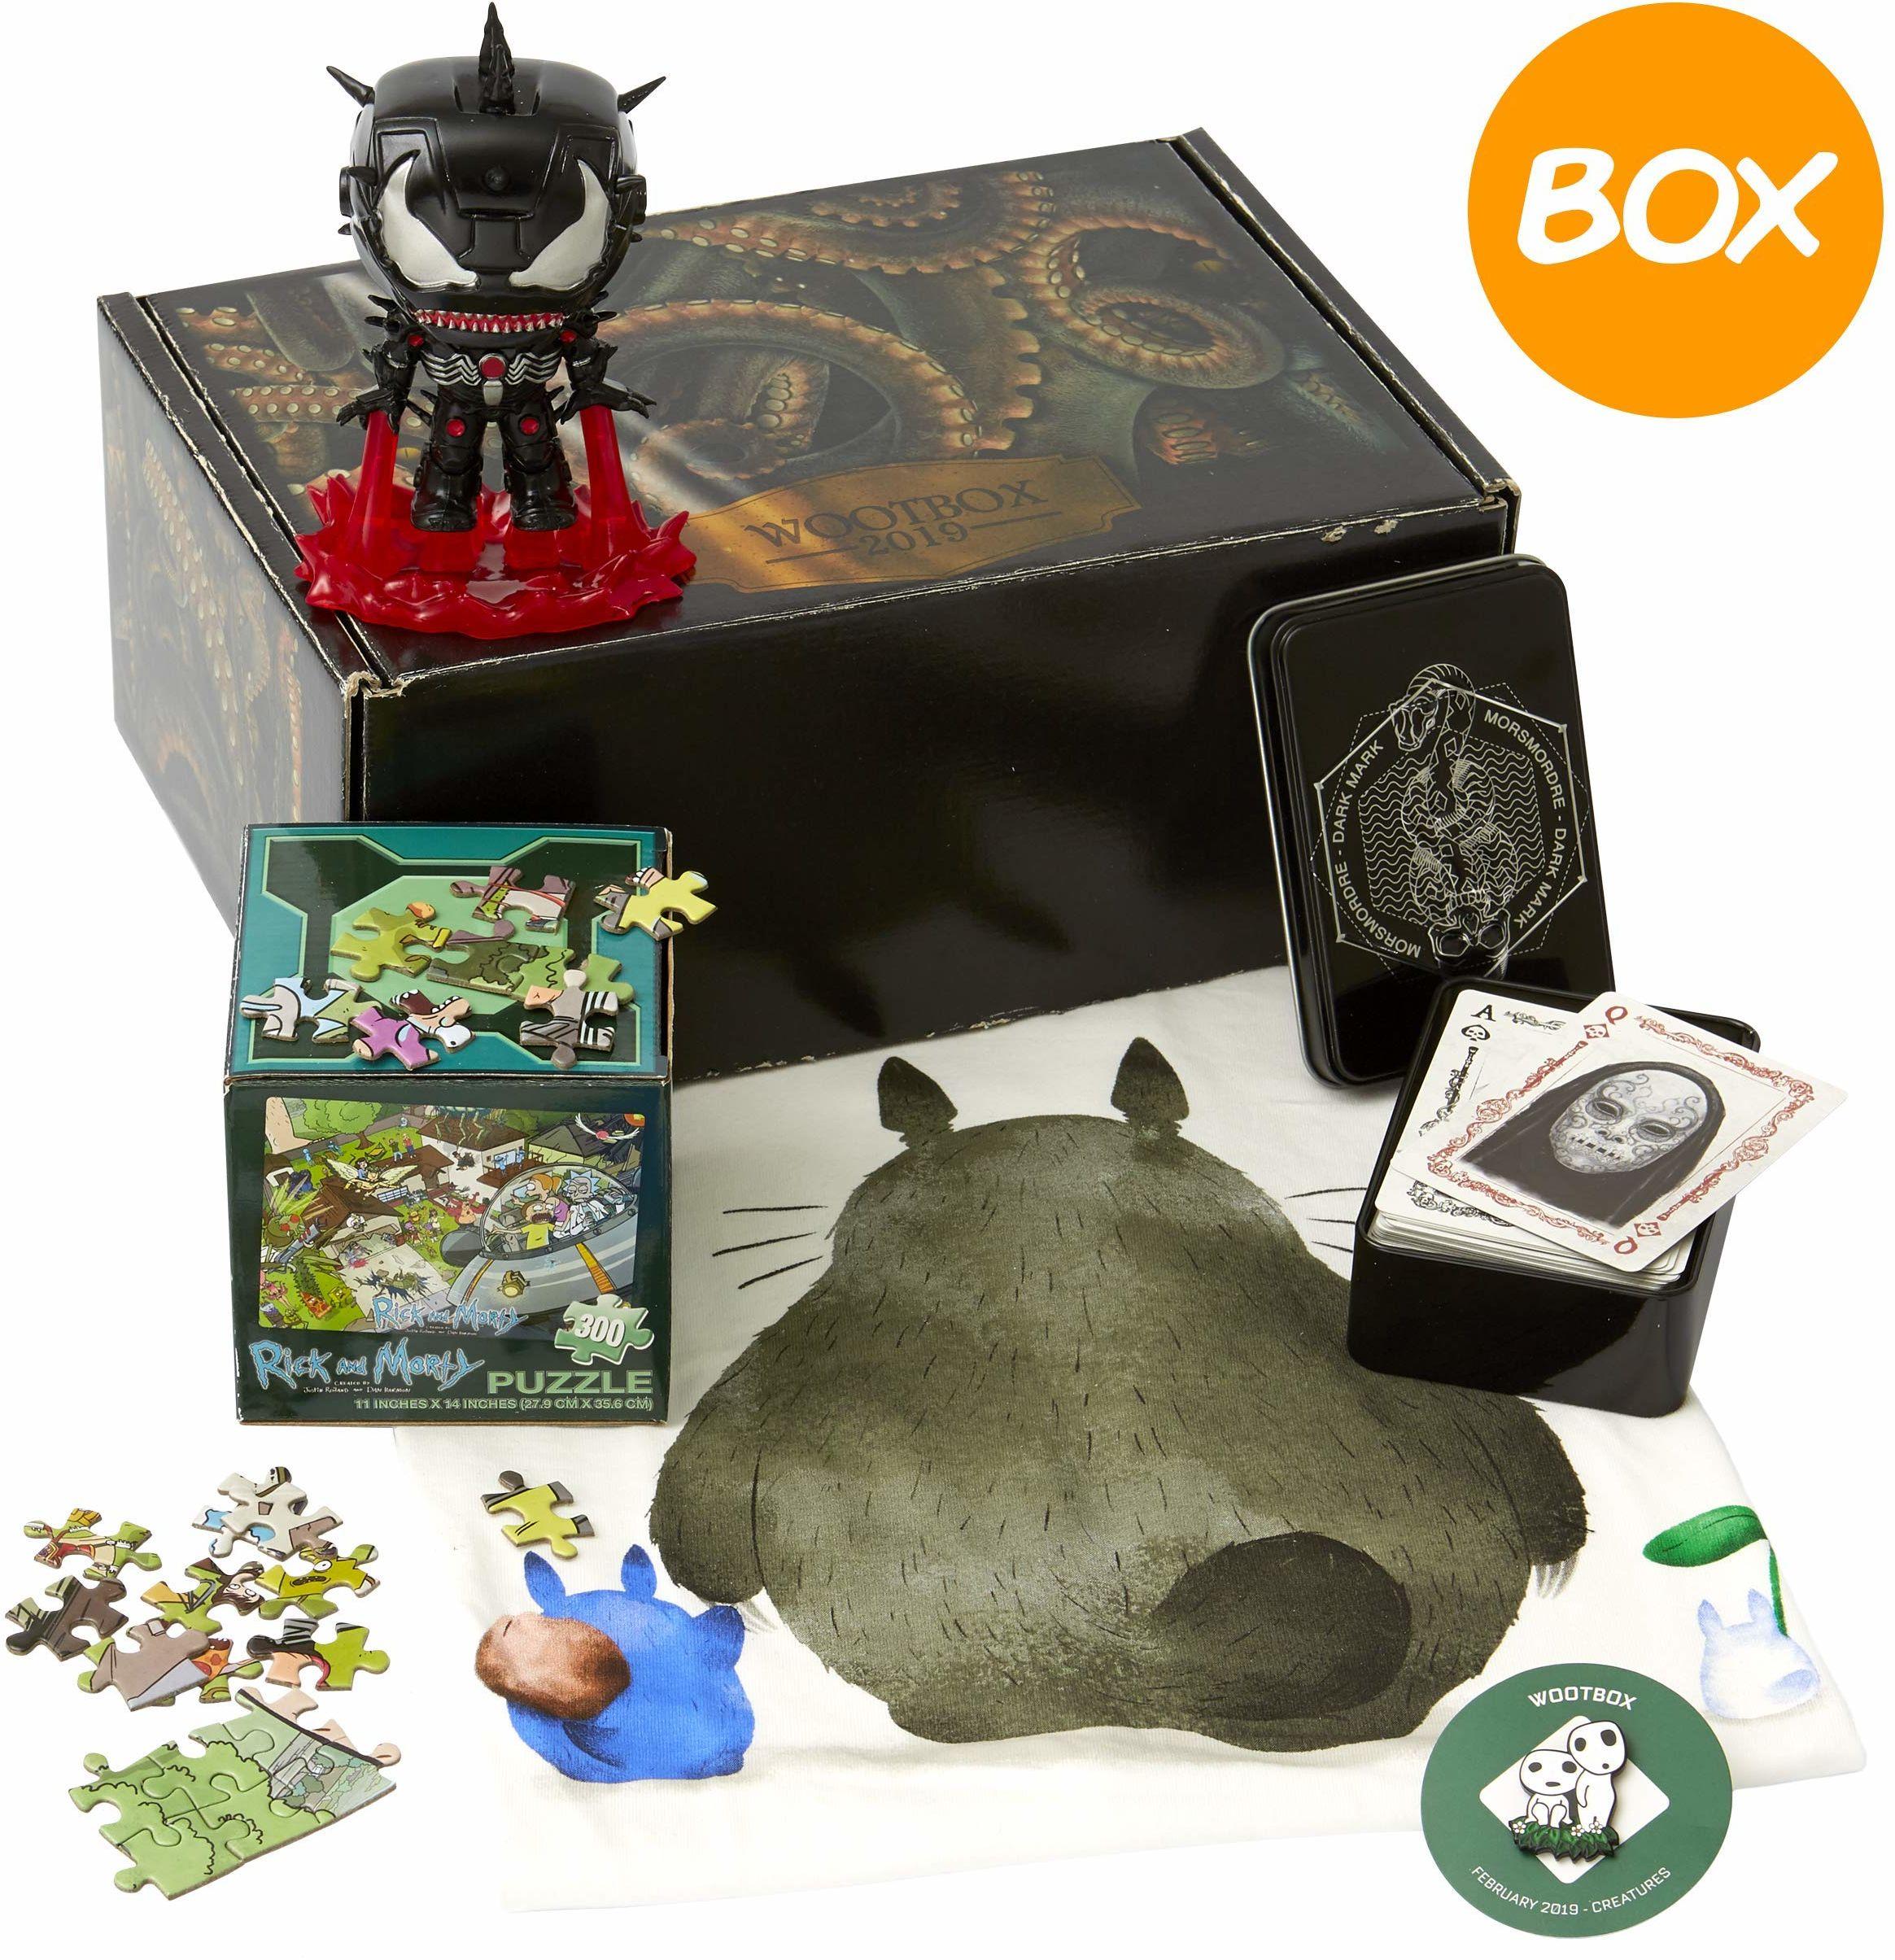 WOOTBOX - Kreaturen - pudełko na prezent - Marvel - Rick & Morty - Harry Potter - Rozmiar S Venom, WTB-2019-002-FR-00H-00S-000, czarne